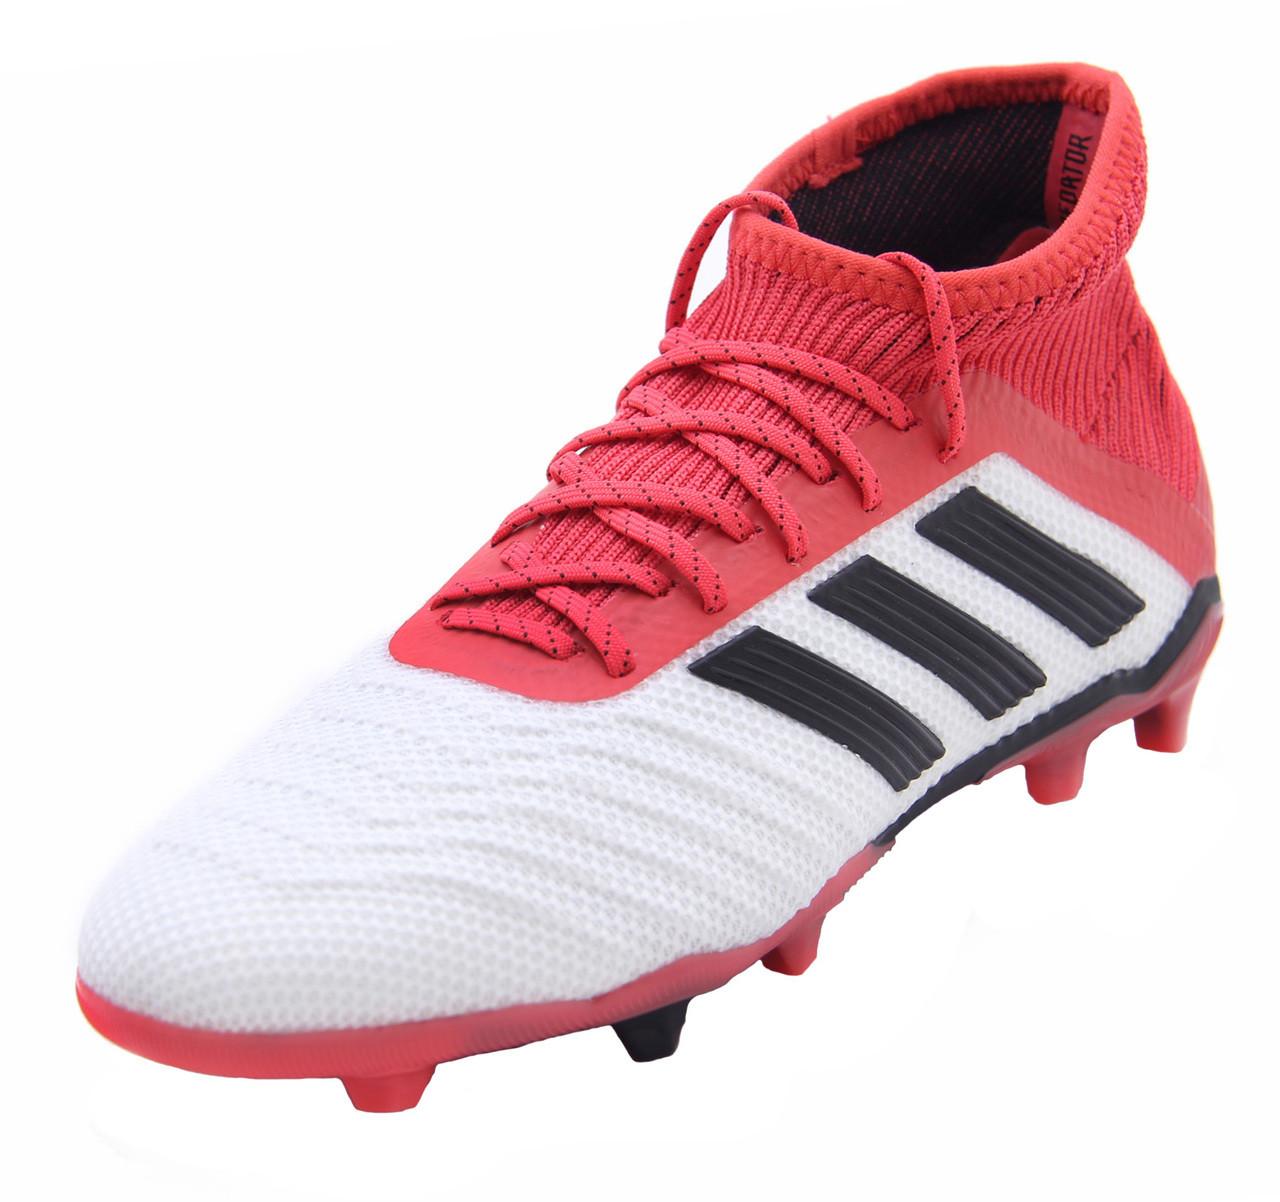 0846b0af6e1a Adidas Predator 18.1 FG J - White/Core Black/Real Coral (21118) - ohp soccer